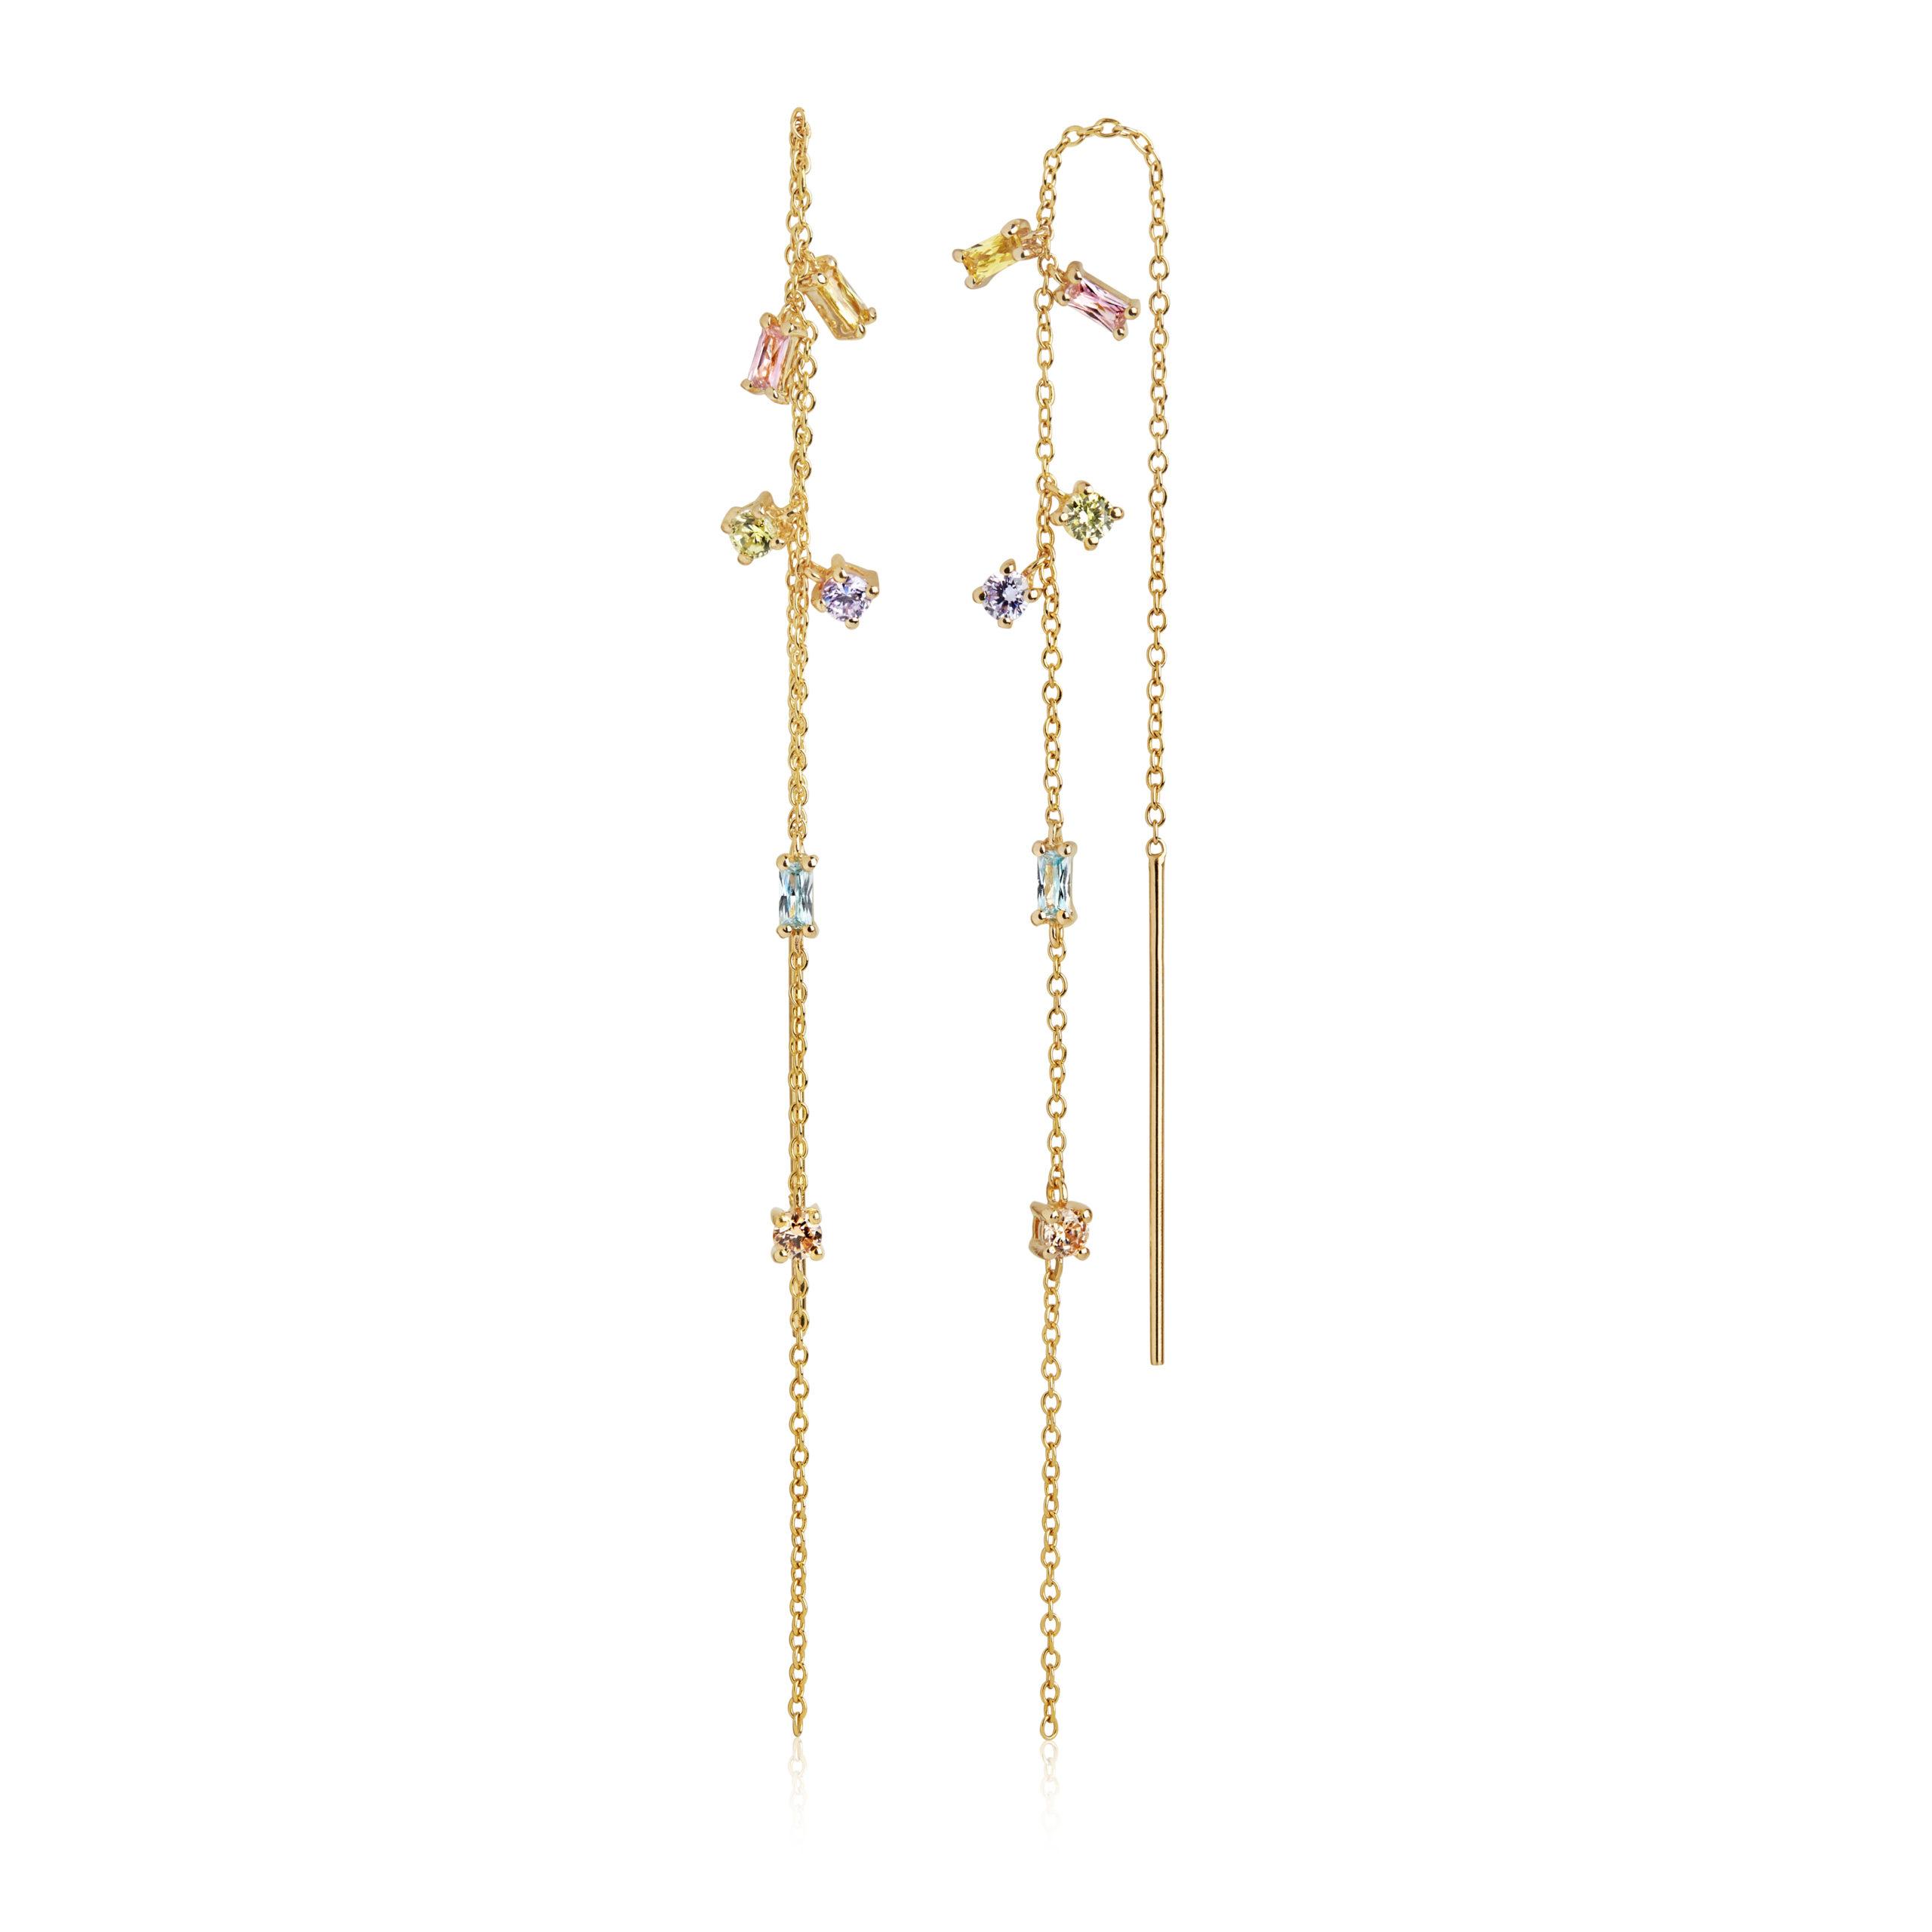 Sif Jakobs Jewellery Princess Chain øreringe, guld/multi